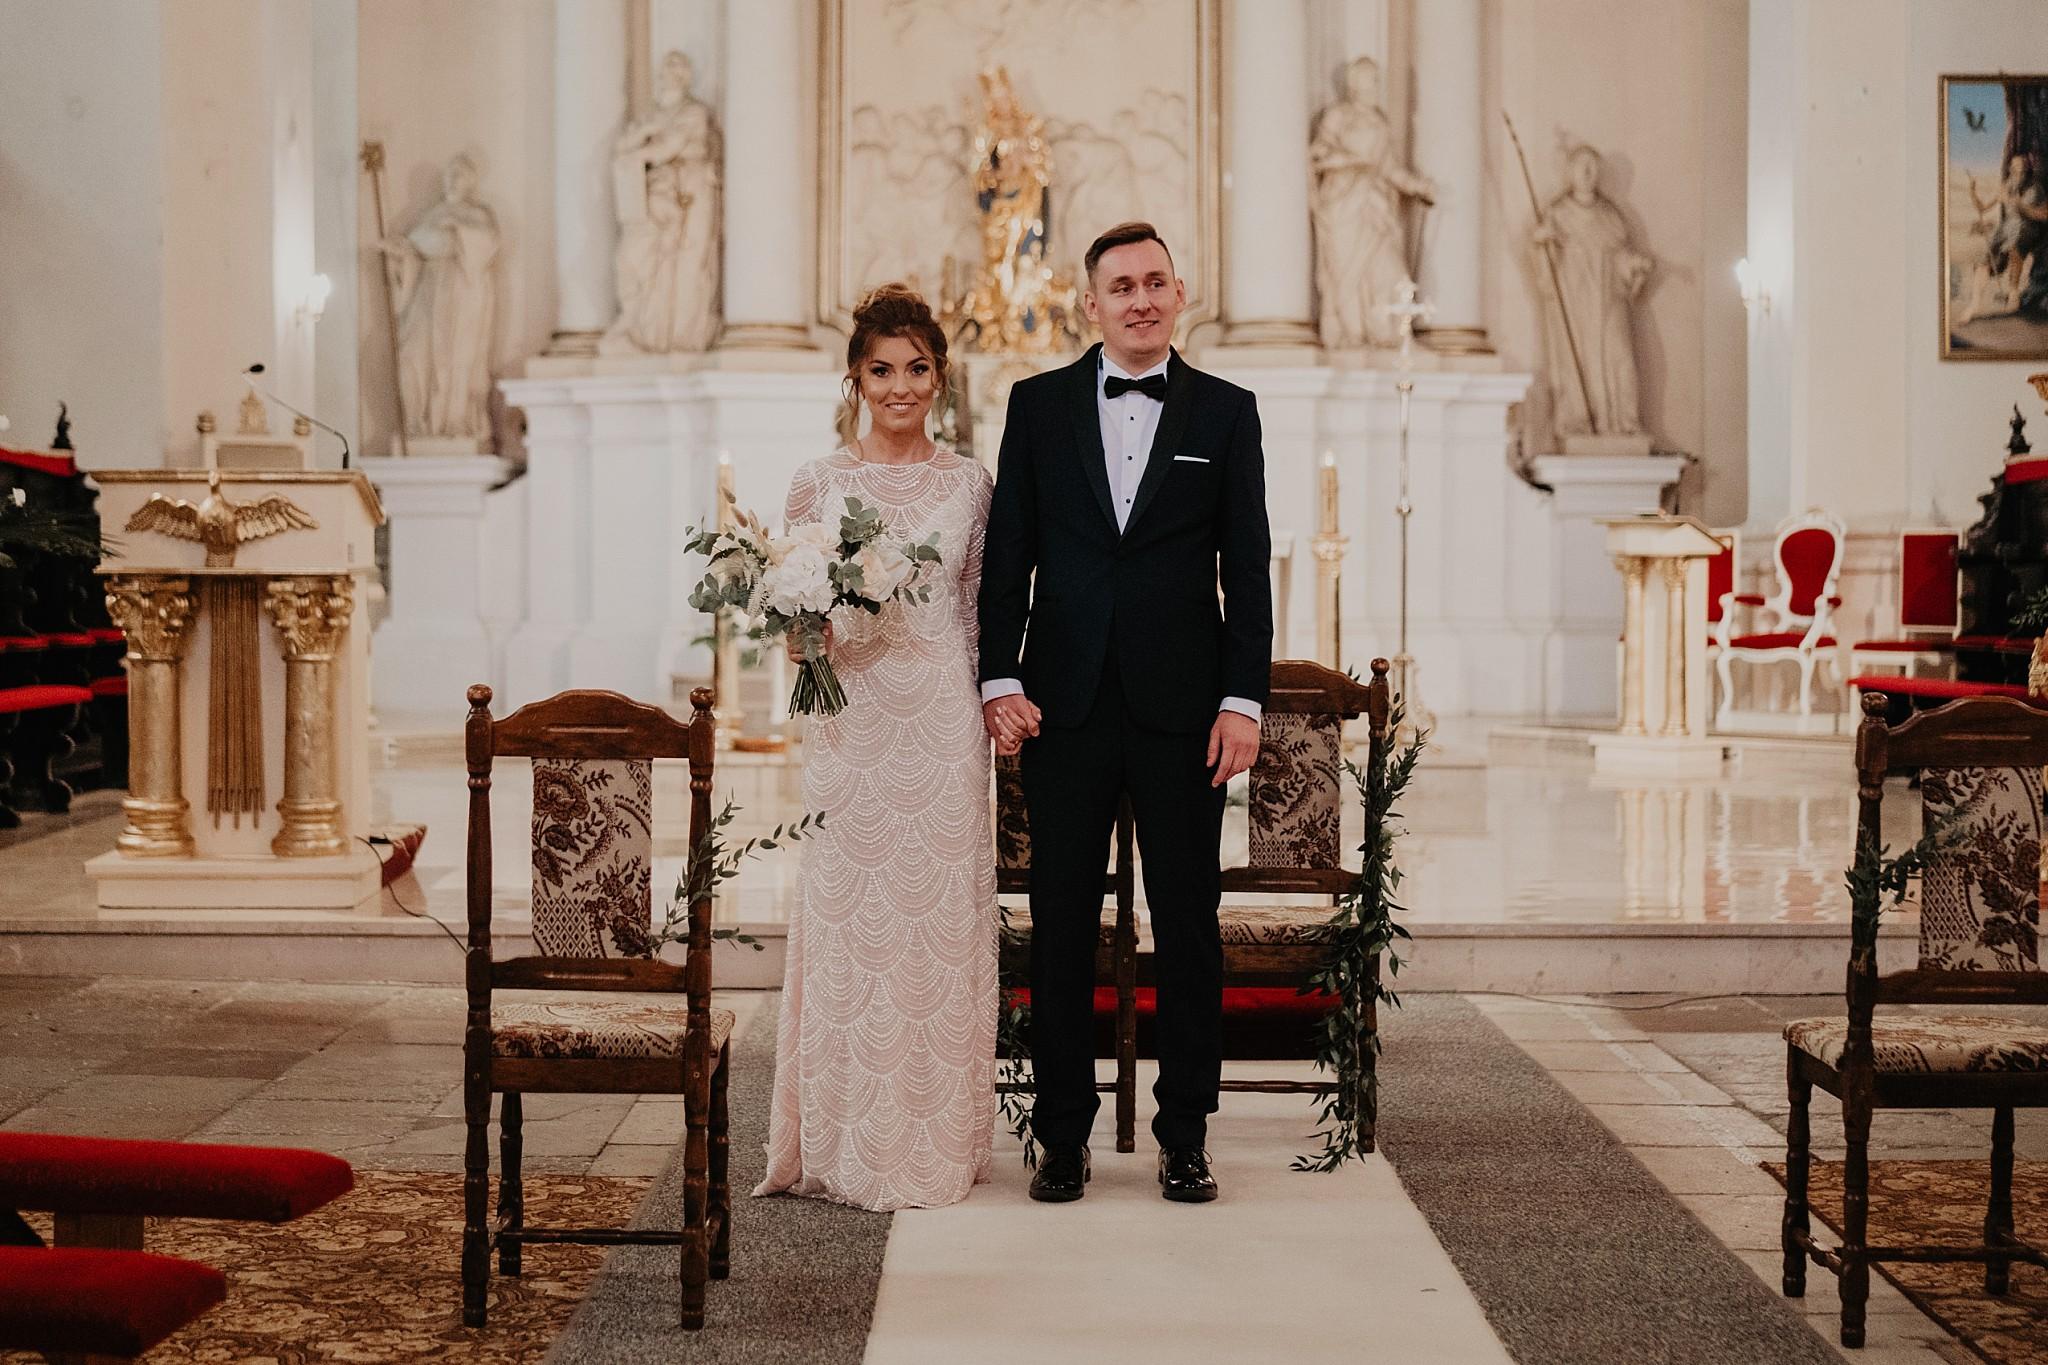 fotograf poznan wesele dobra truskawka piekne wesele pod poznaniem wesele w dobrej truskawce piekna para mloda slub marzen slub koronawirus slub listopad wesele koronawirus 206